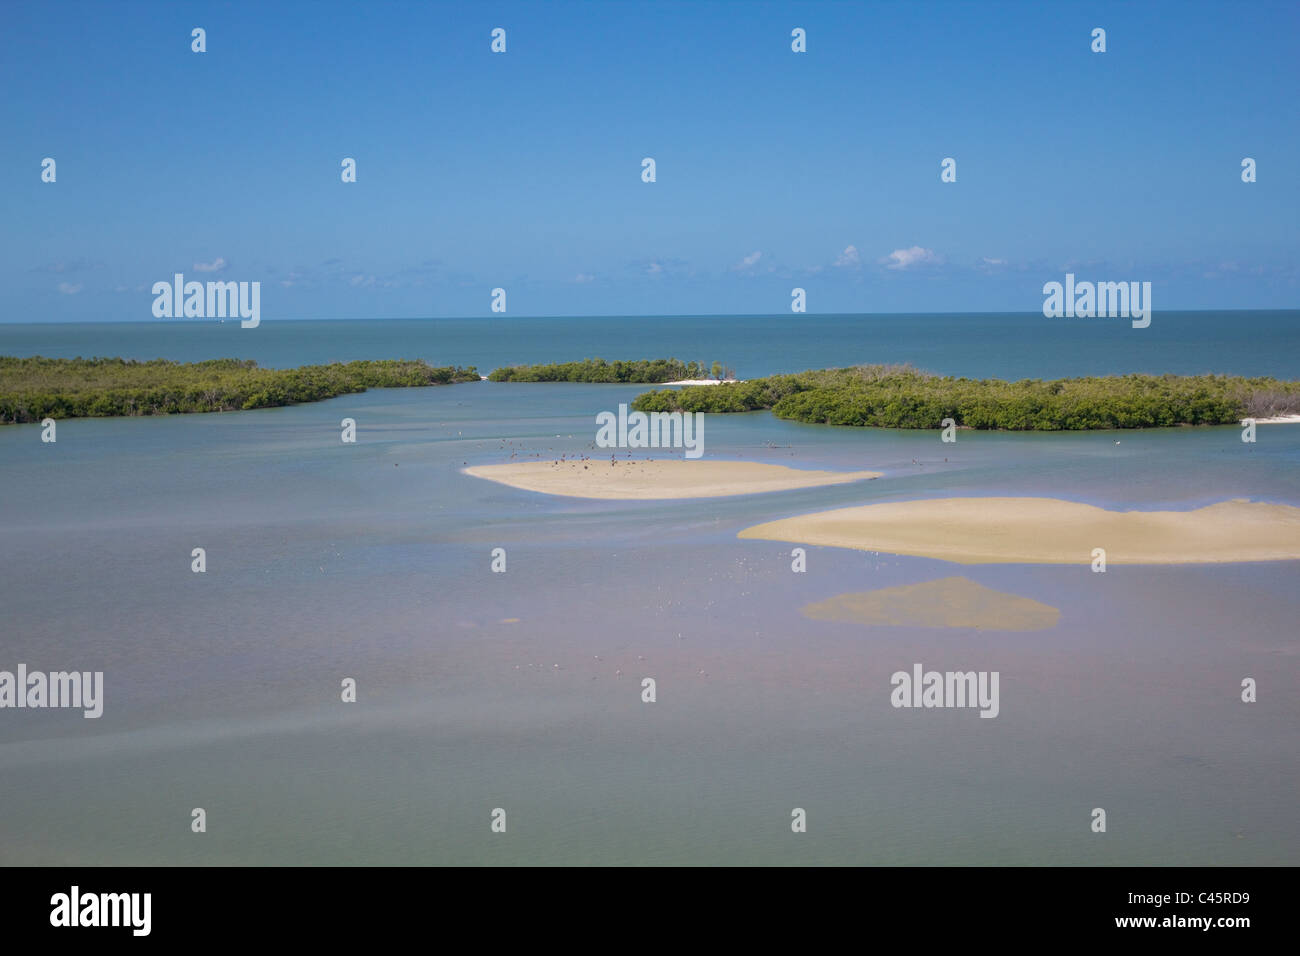 Ten Thousand Islands area South of Marco Island Florida West Coast. - Stock Image